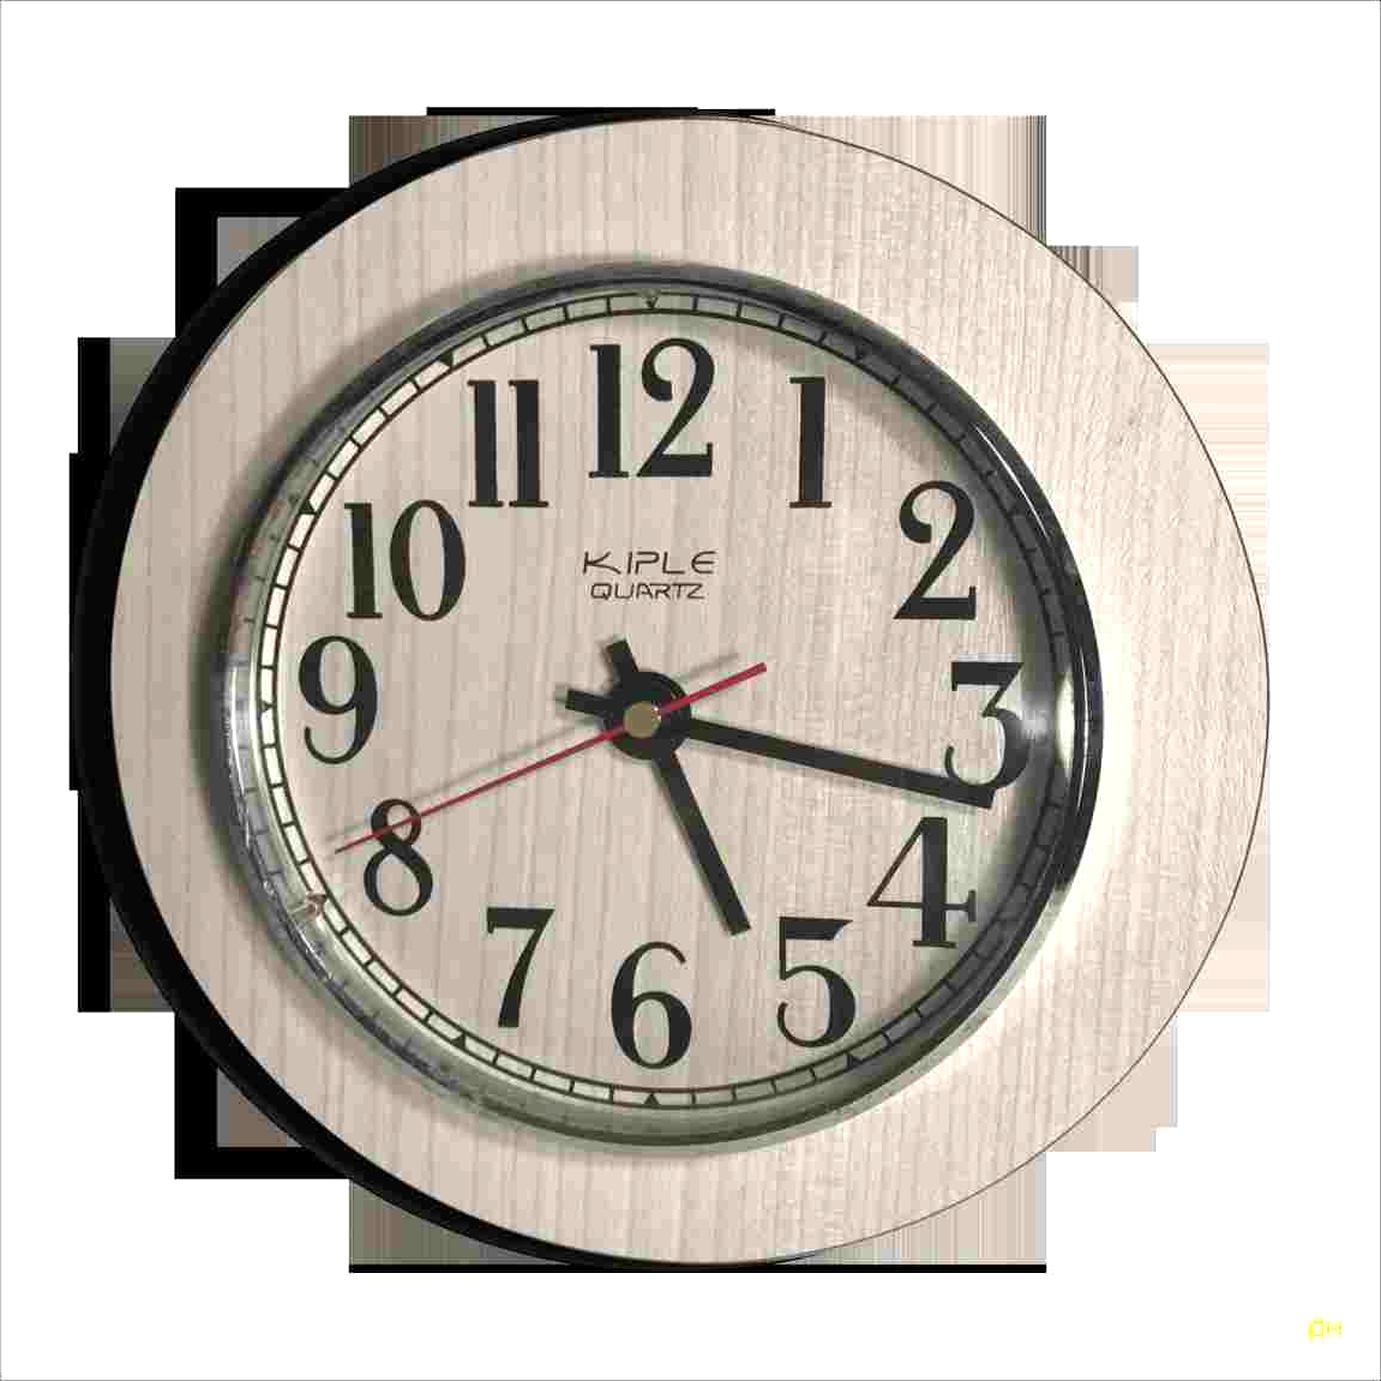 Technoline WT 600 Horloge murale /à quartz Rouge